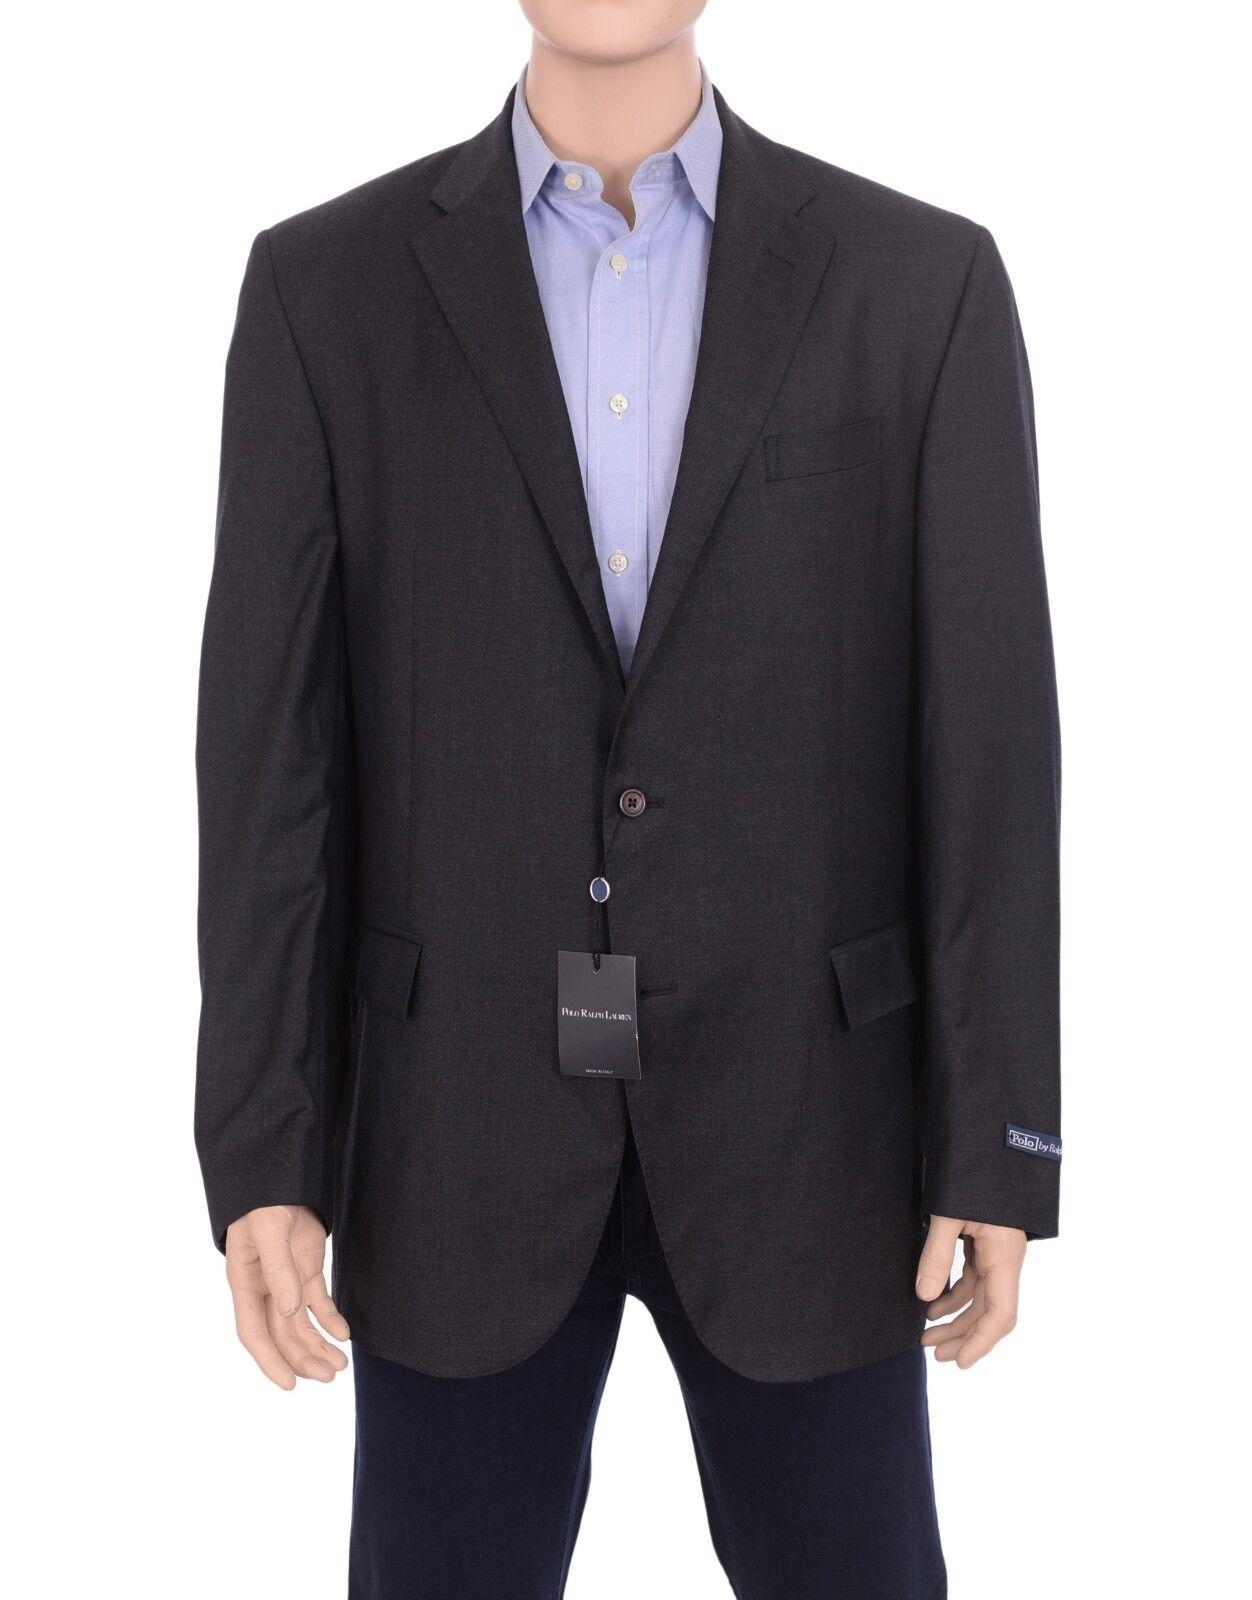 Polo Ralph Lauren  48L Classic Fit  Herren Solid grau Wool Blazer Sportcoat